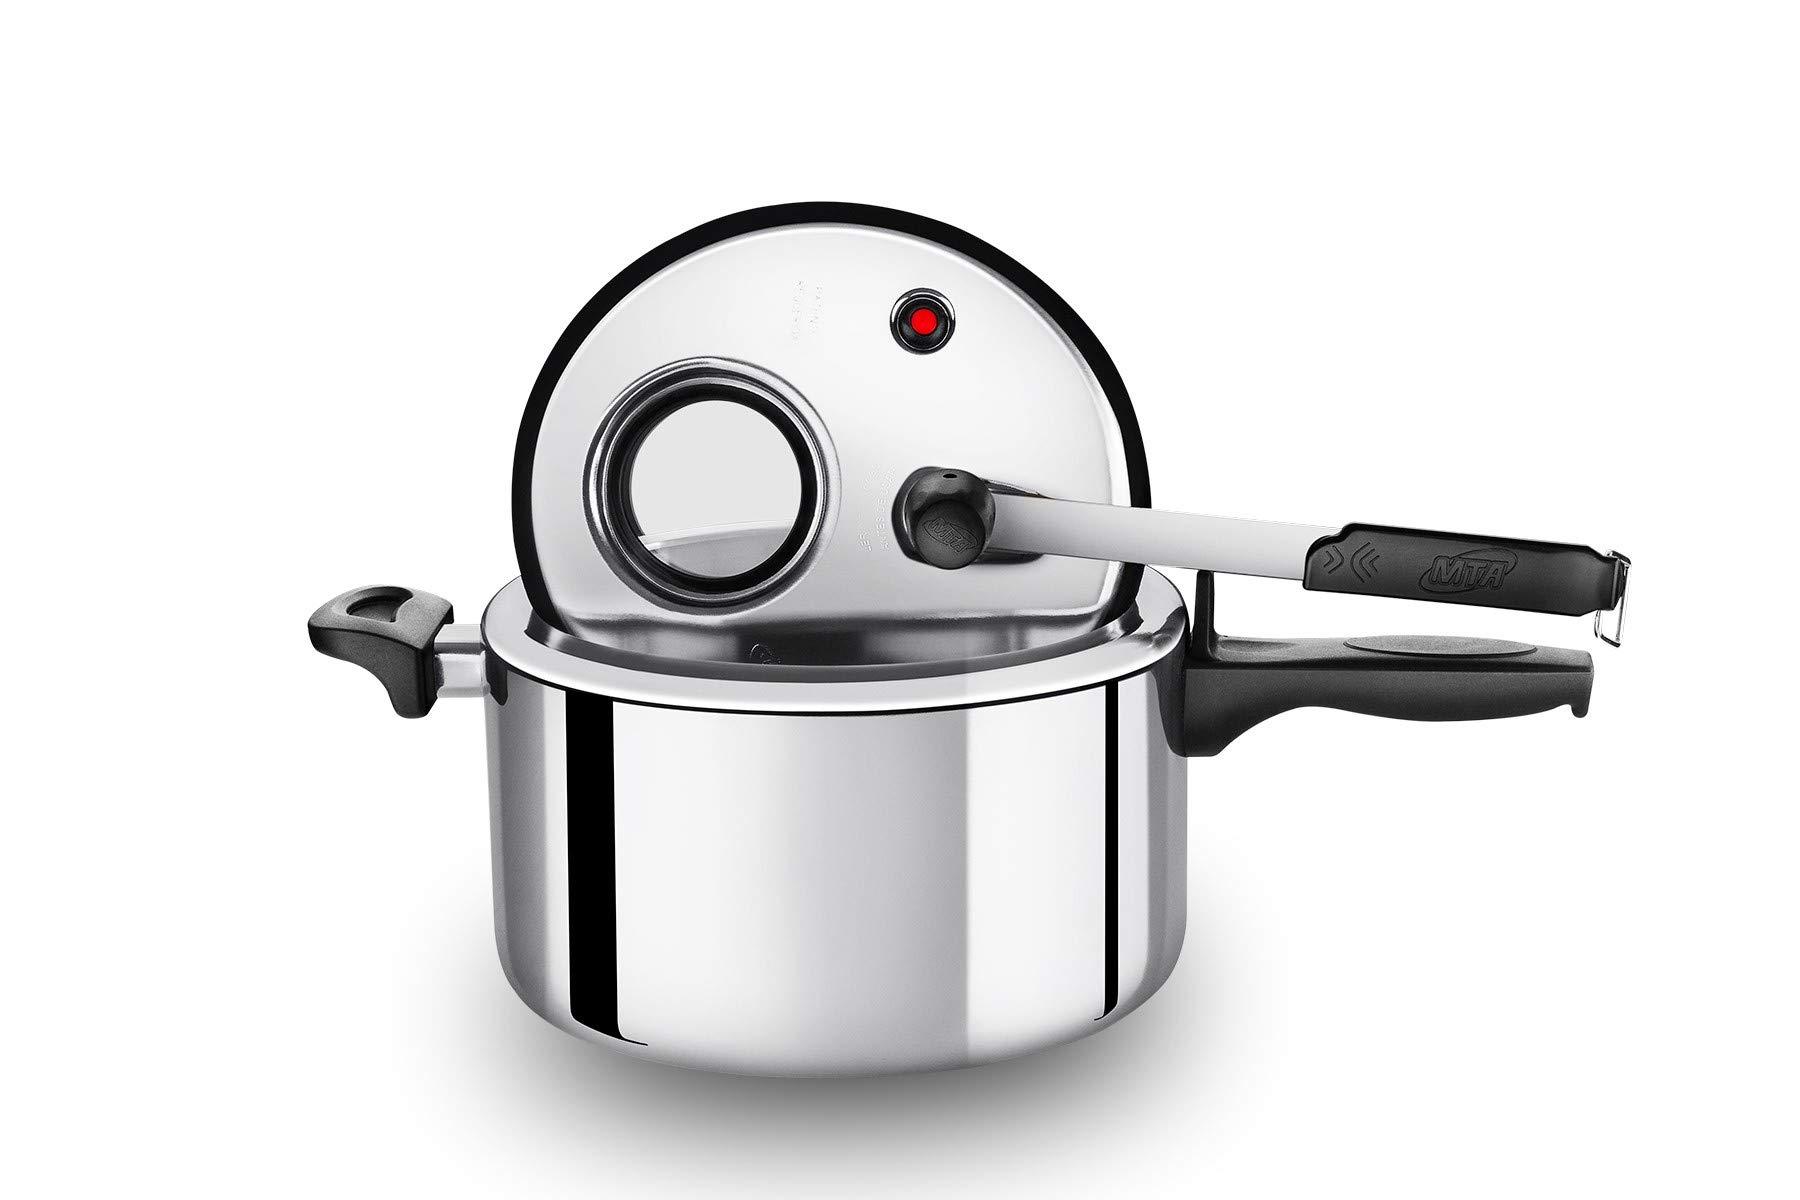 Aluminum pressure cooker with display. Internal closure. (polished aluminum, 6.3)